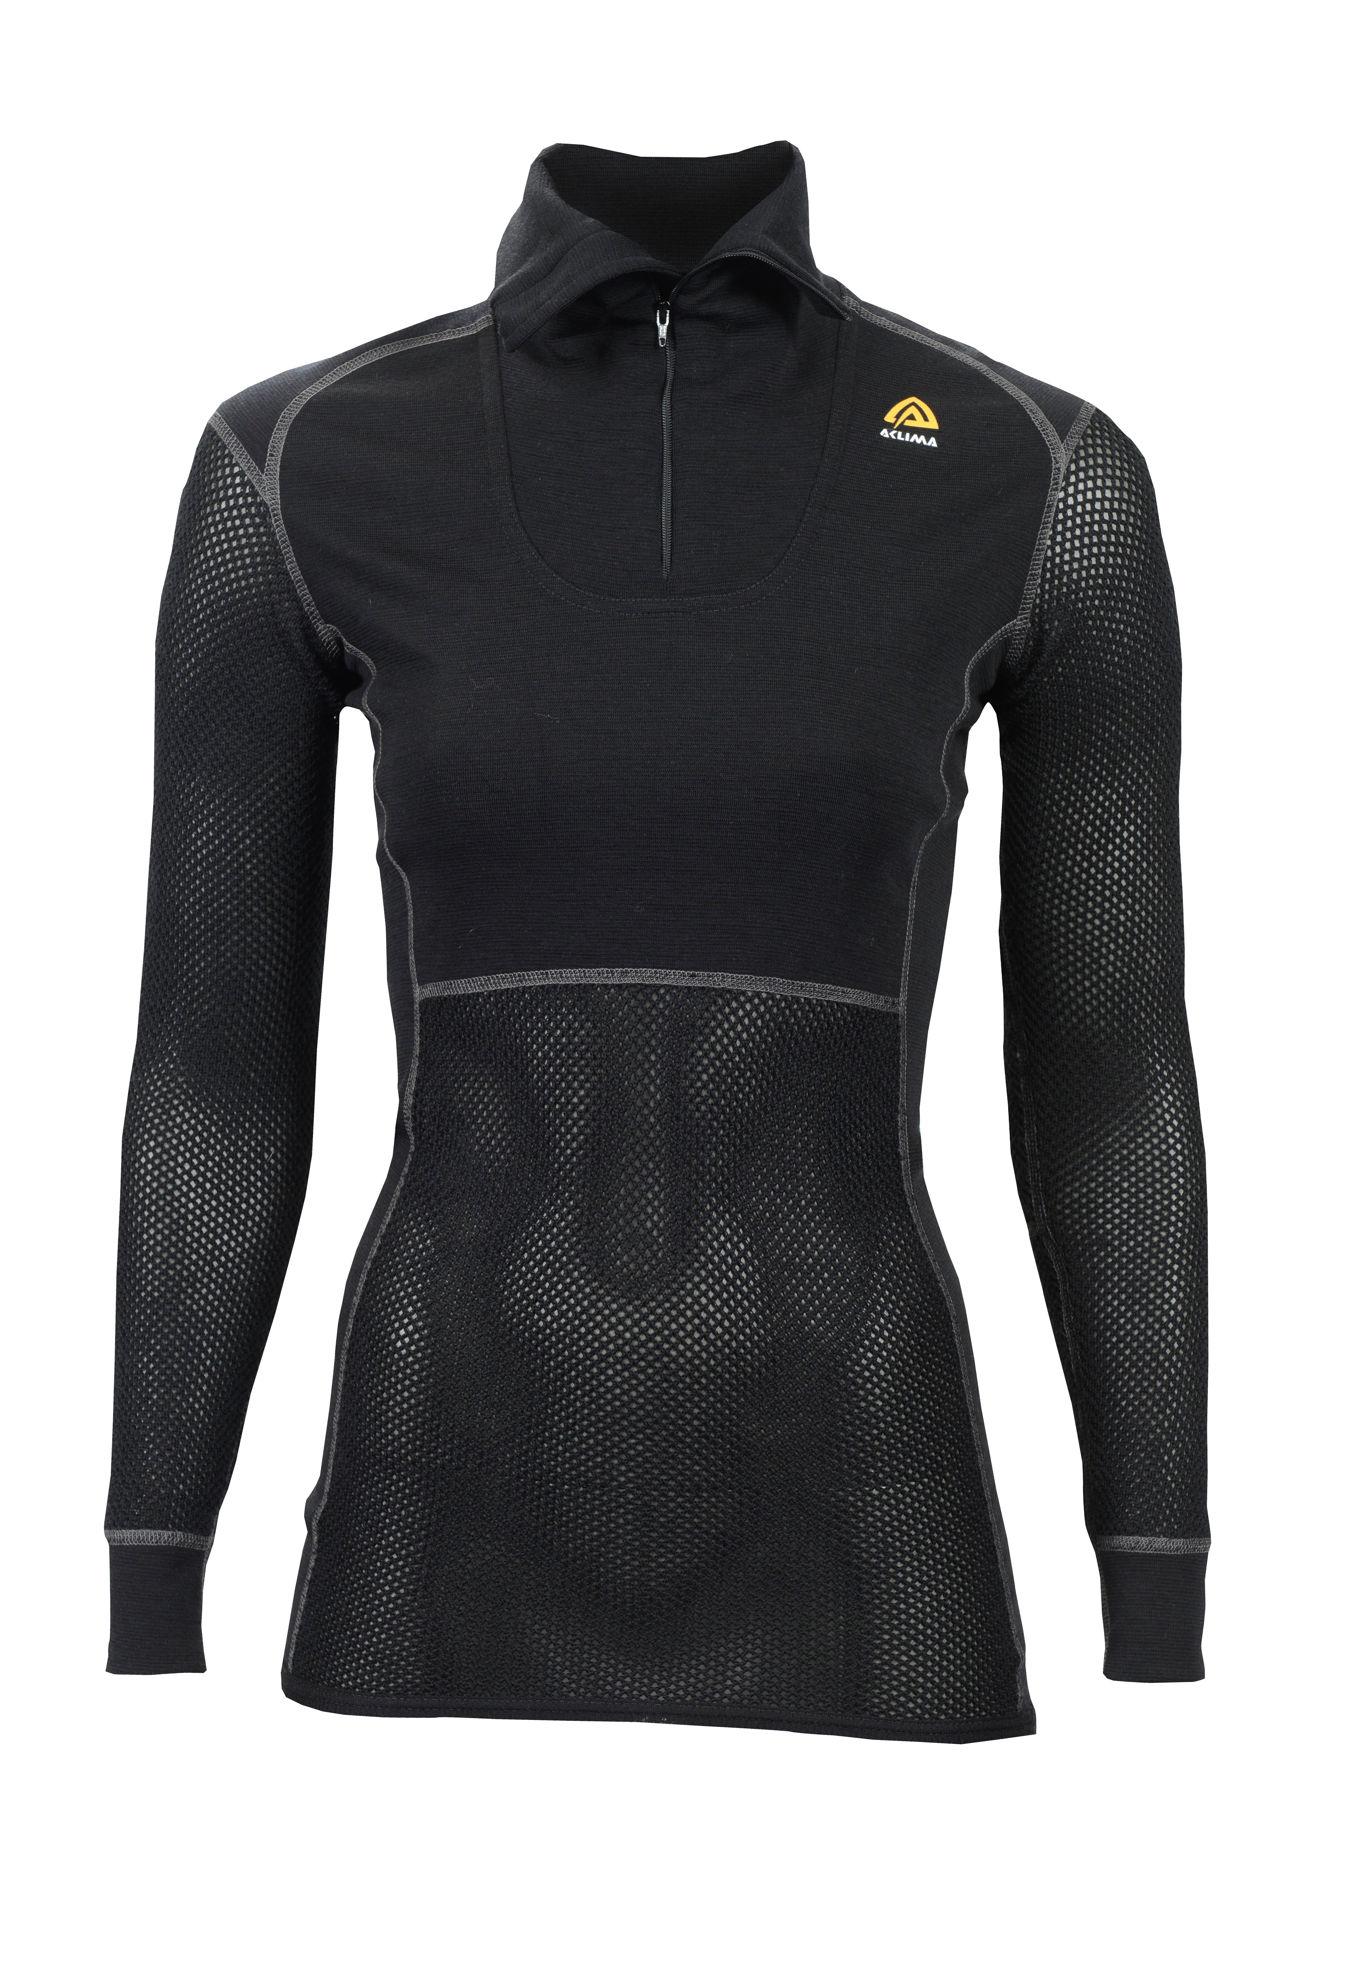 Bild på Aclima WoolNet Polo Shirt with zip, Dam i Merinoull - Jet Black